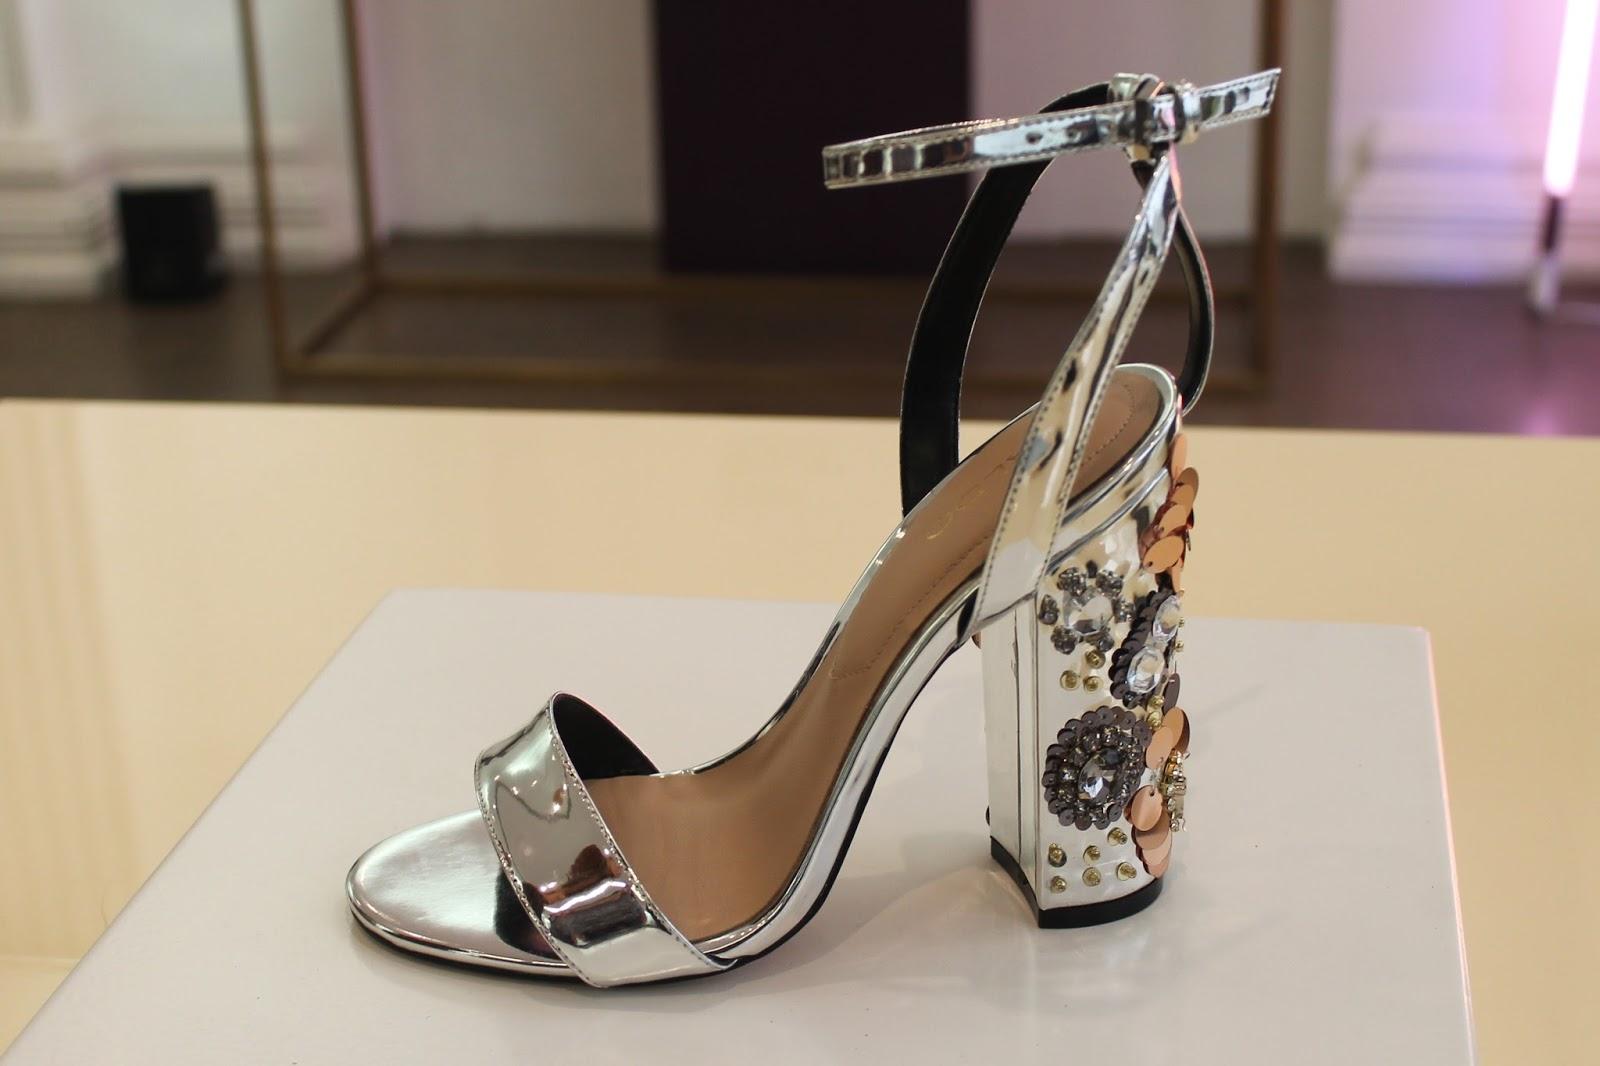 aldo shoes v&a waterfront puzzles